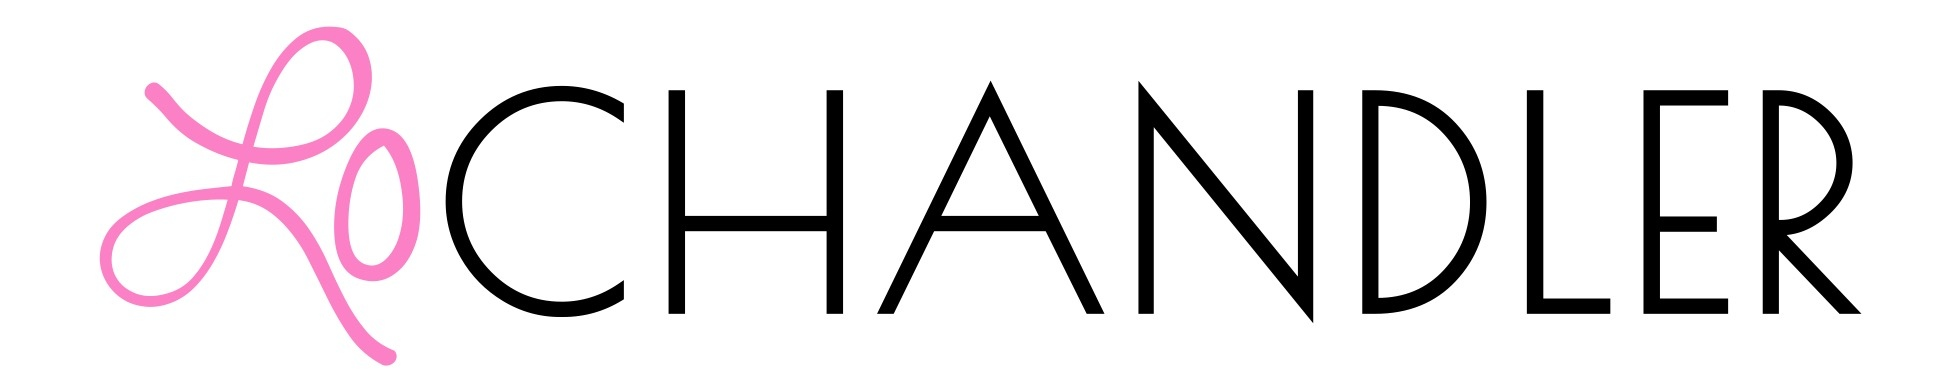 LoChandler.com